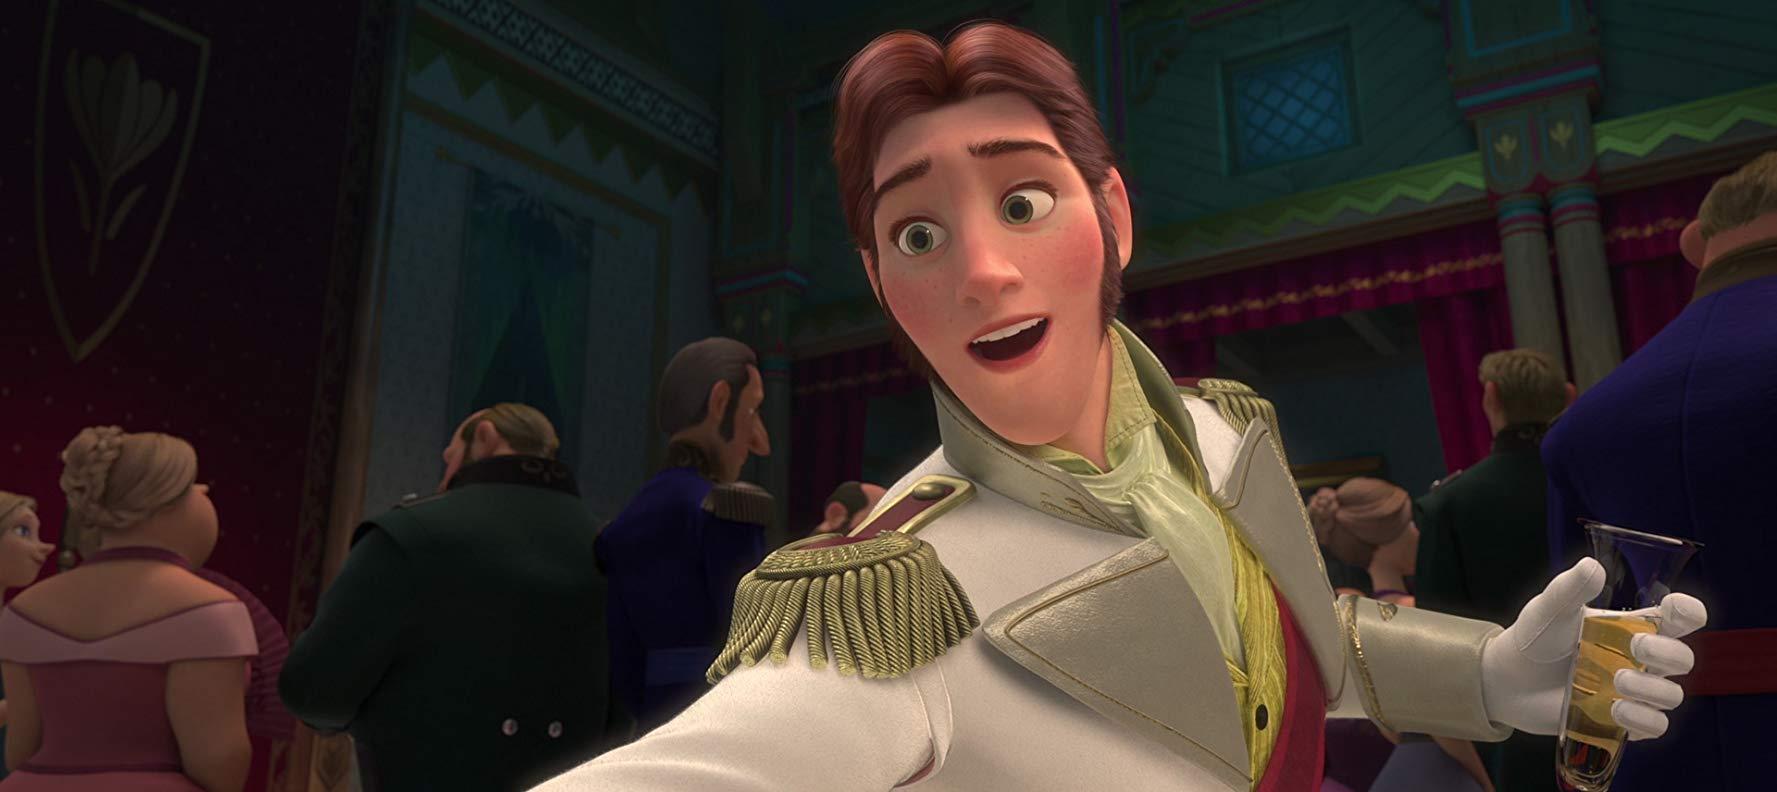 Hans finge estar apaixonado pela Princesa Anna para roubar o trono de Elsa.